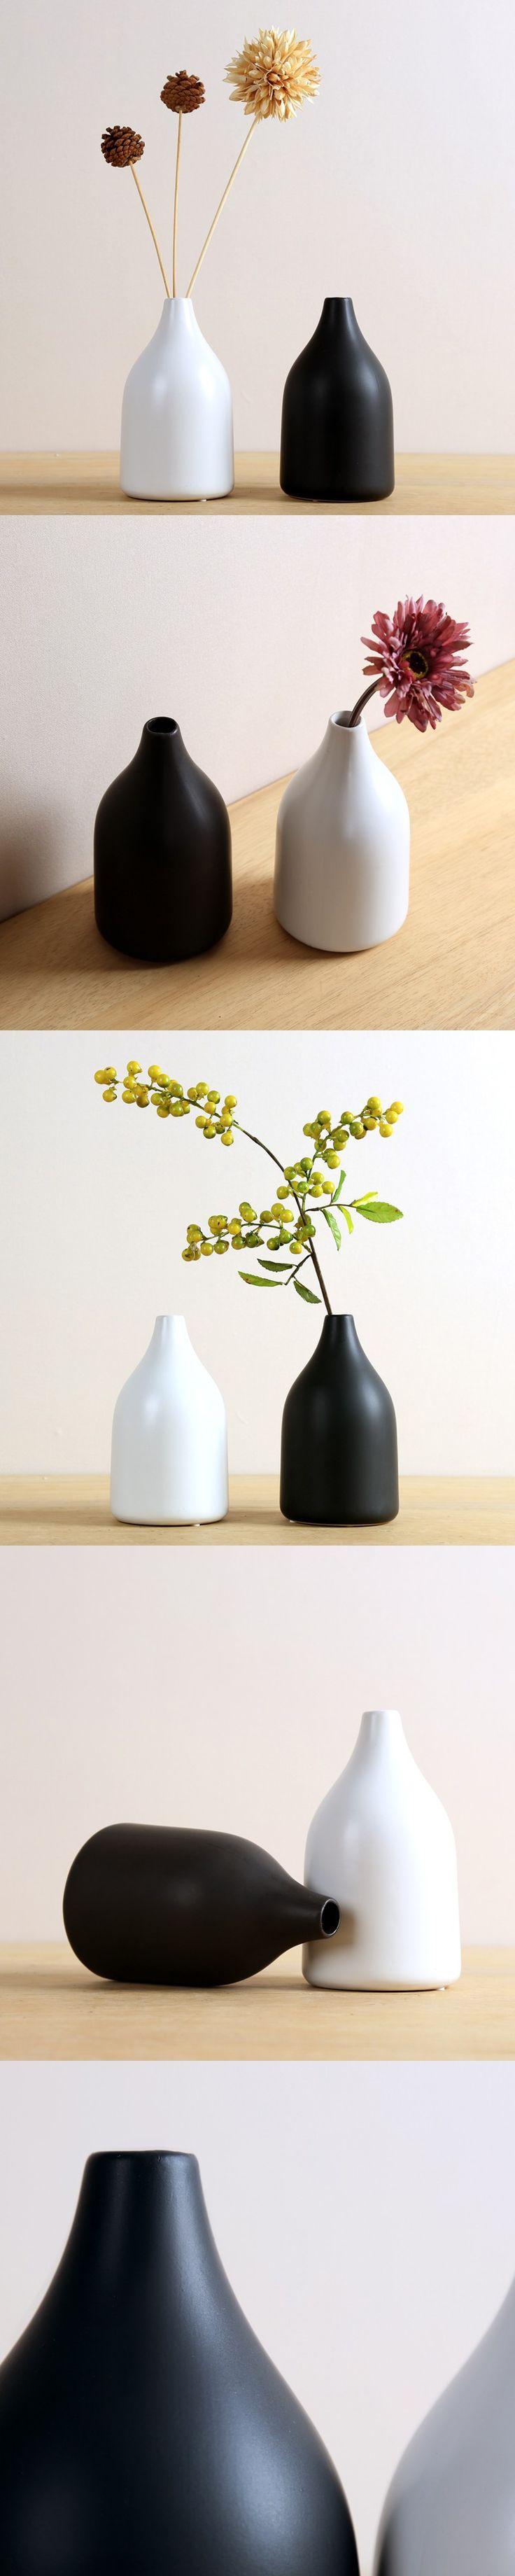 Black and white ceramic vase Home Furnishing Japanese modern minimalist living room decoration decoration flower vase. $67.44